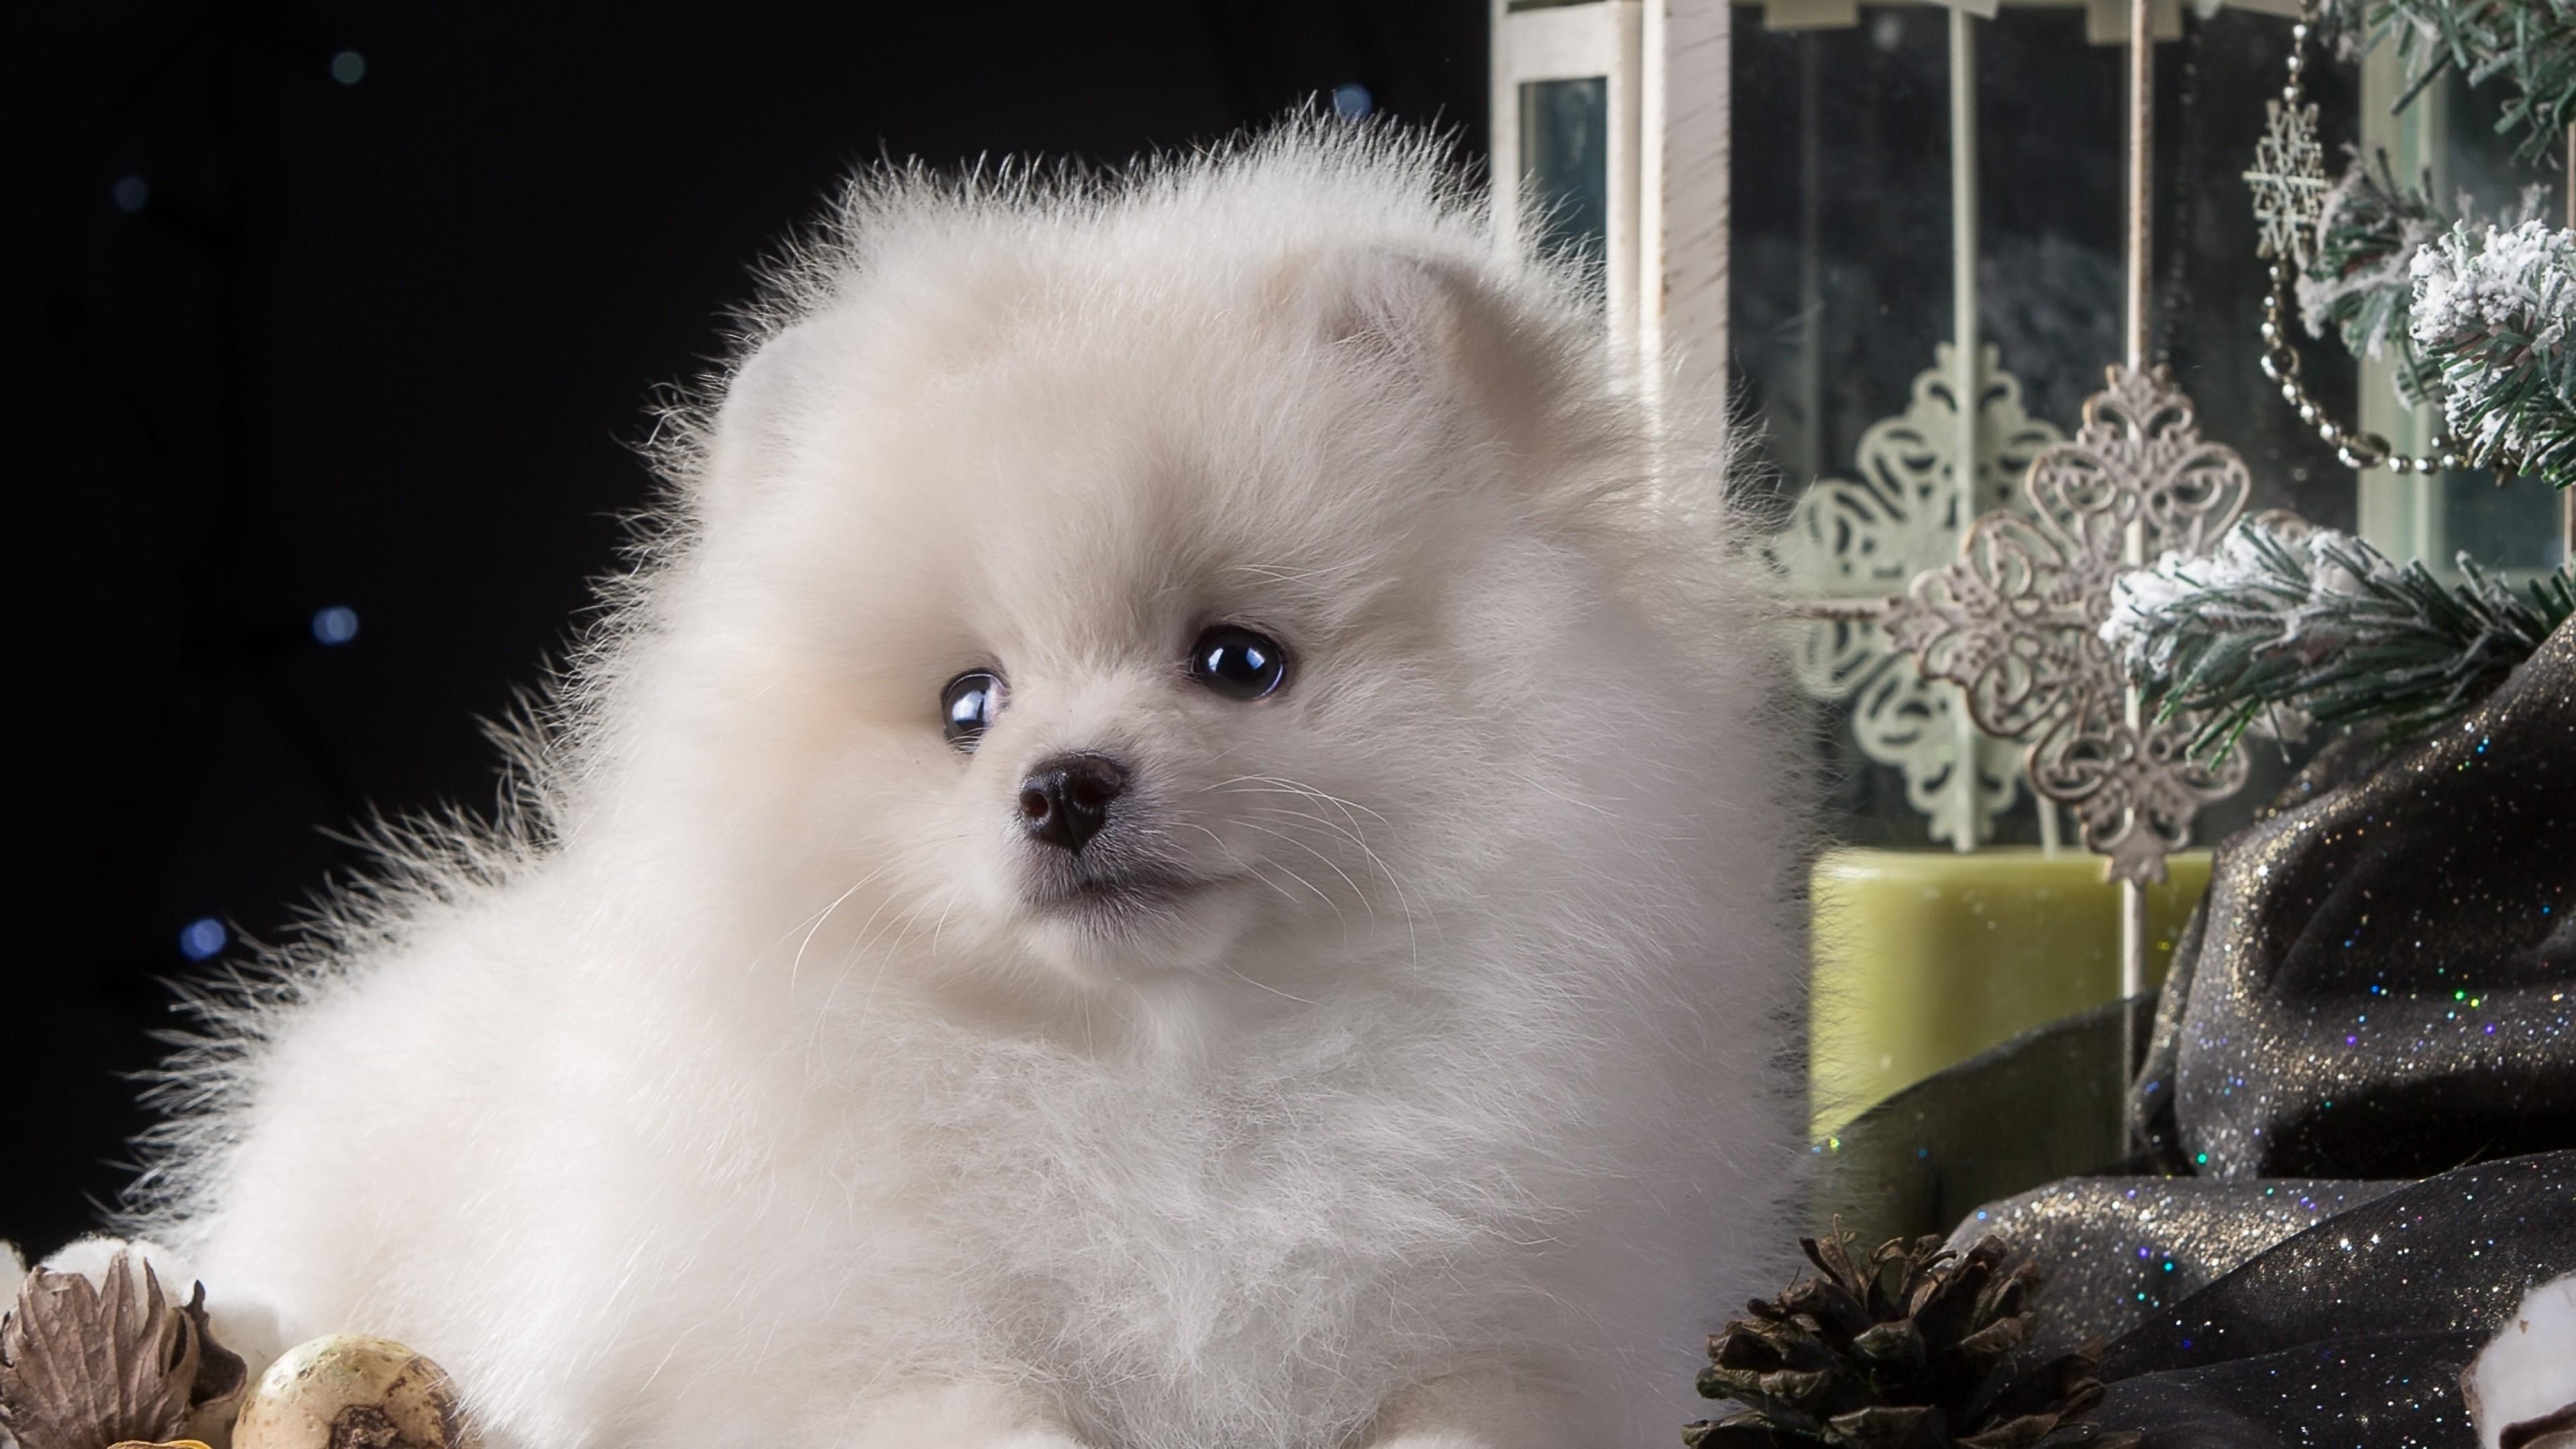 puppy white cute 4k 1542237835 - Puppy White Cute 4k - puppy wallpapers, dog wallpapers, cute wallpapers, animals wallpapers